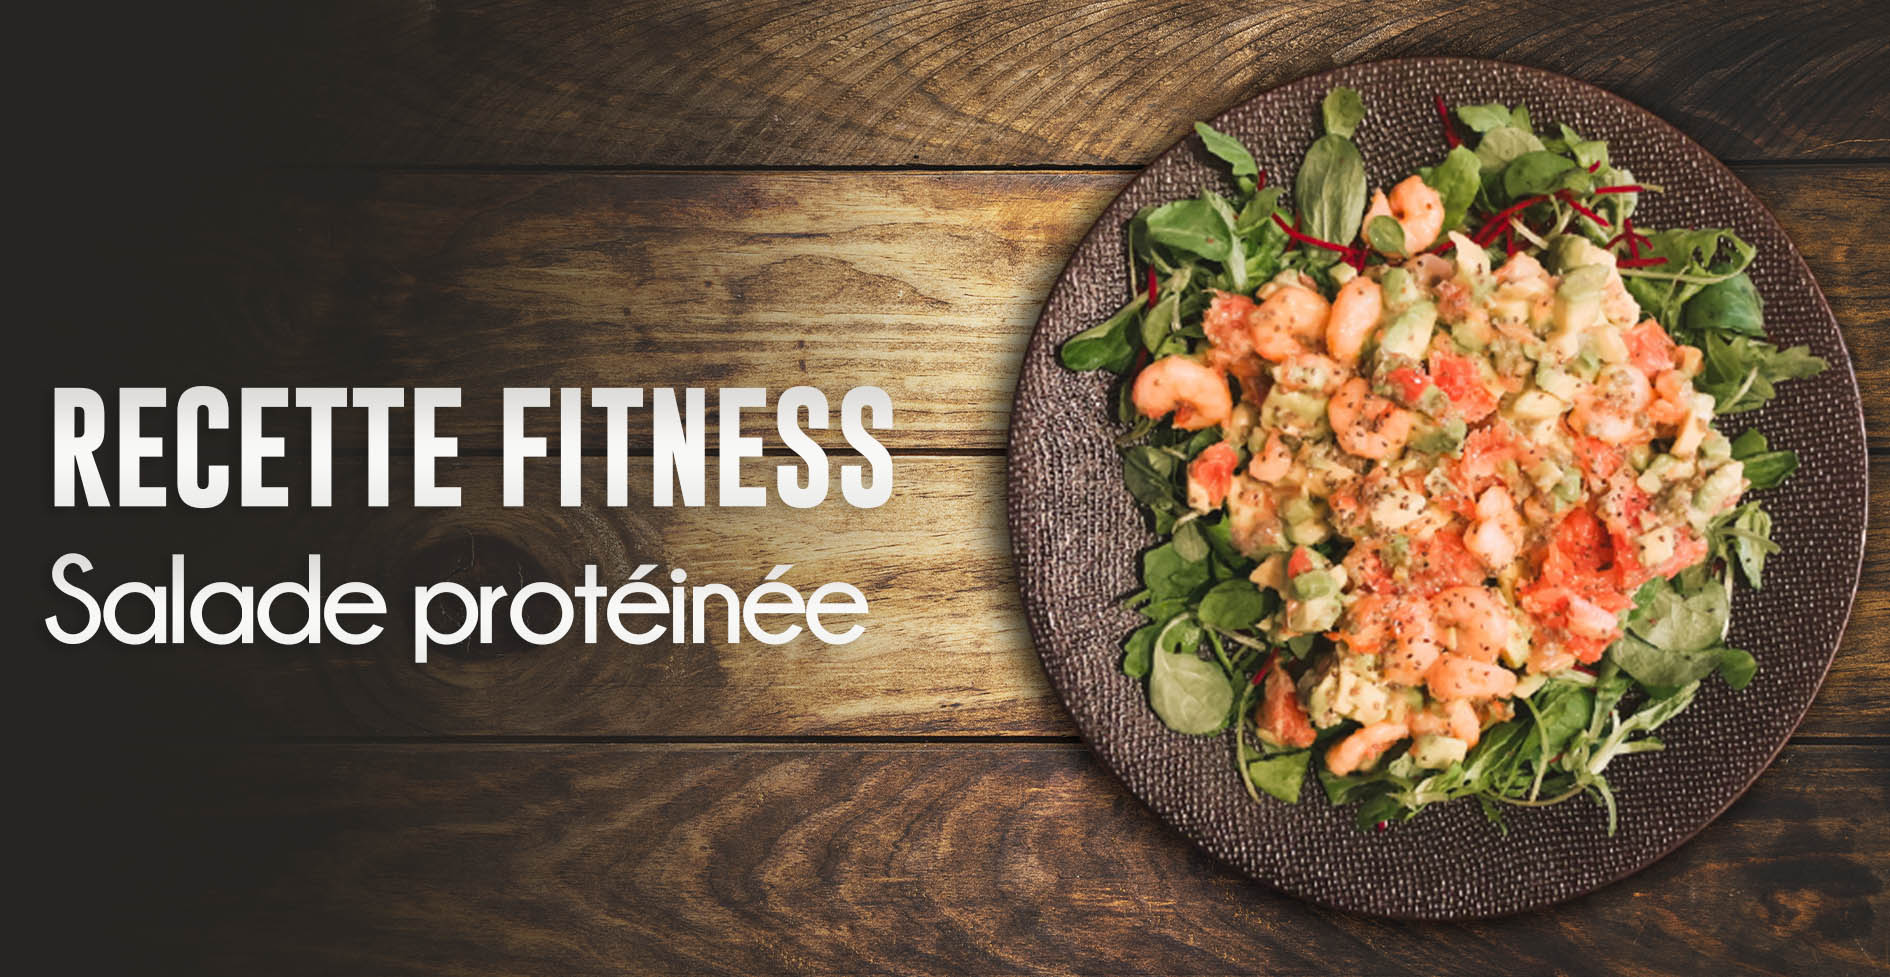 Recette fitness : la salade fitness